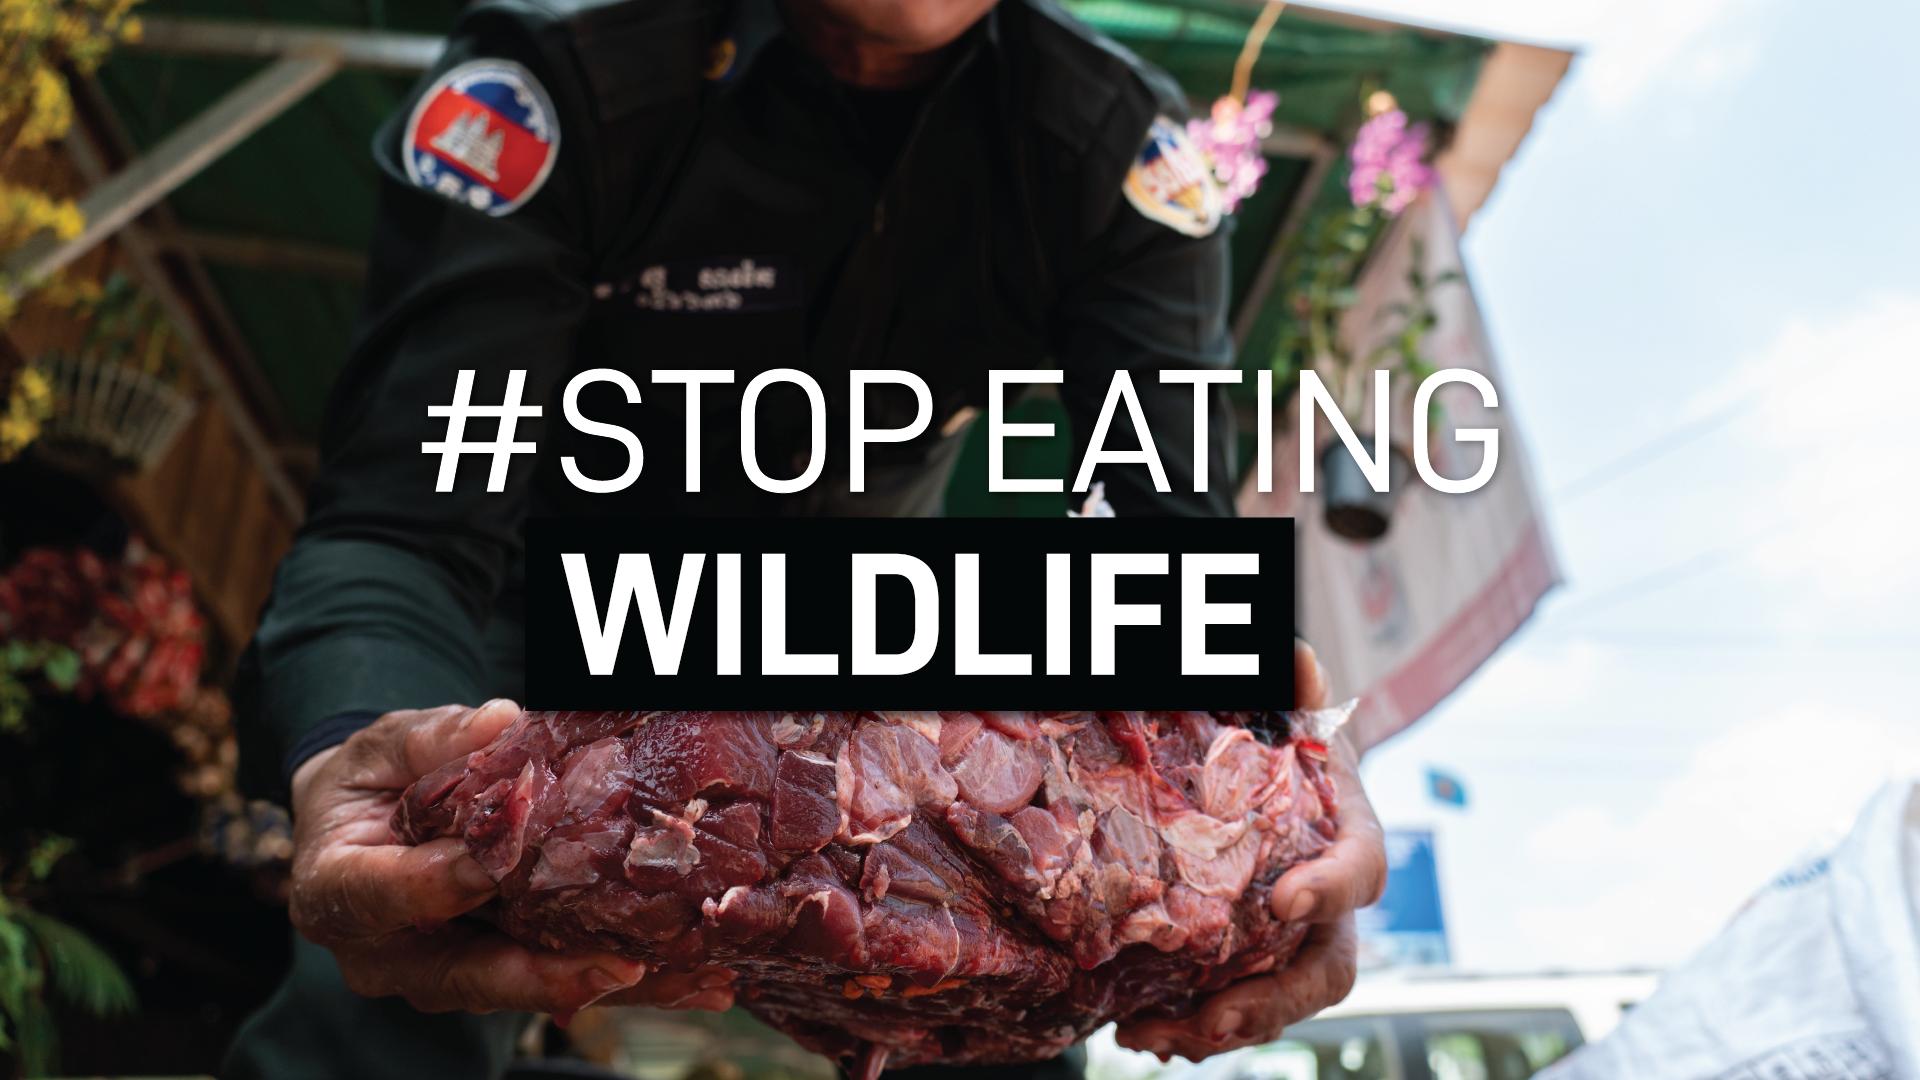 Wildlife Alliance launches #StopEatingWildlife campaign